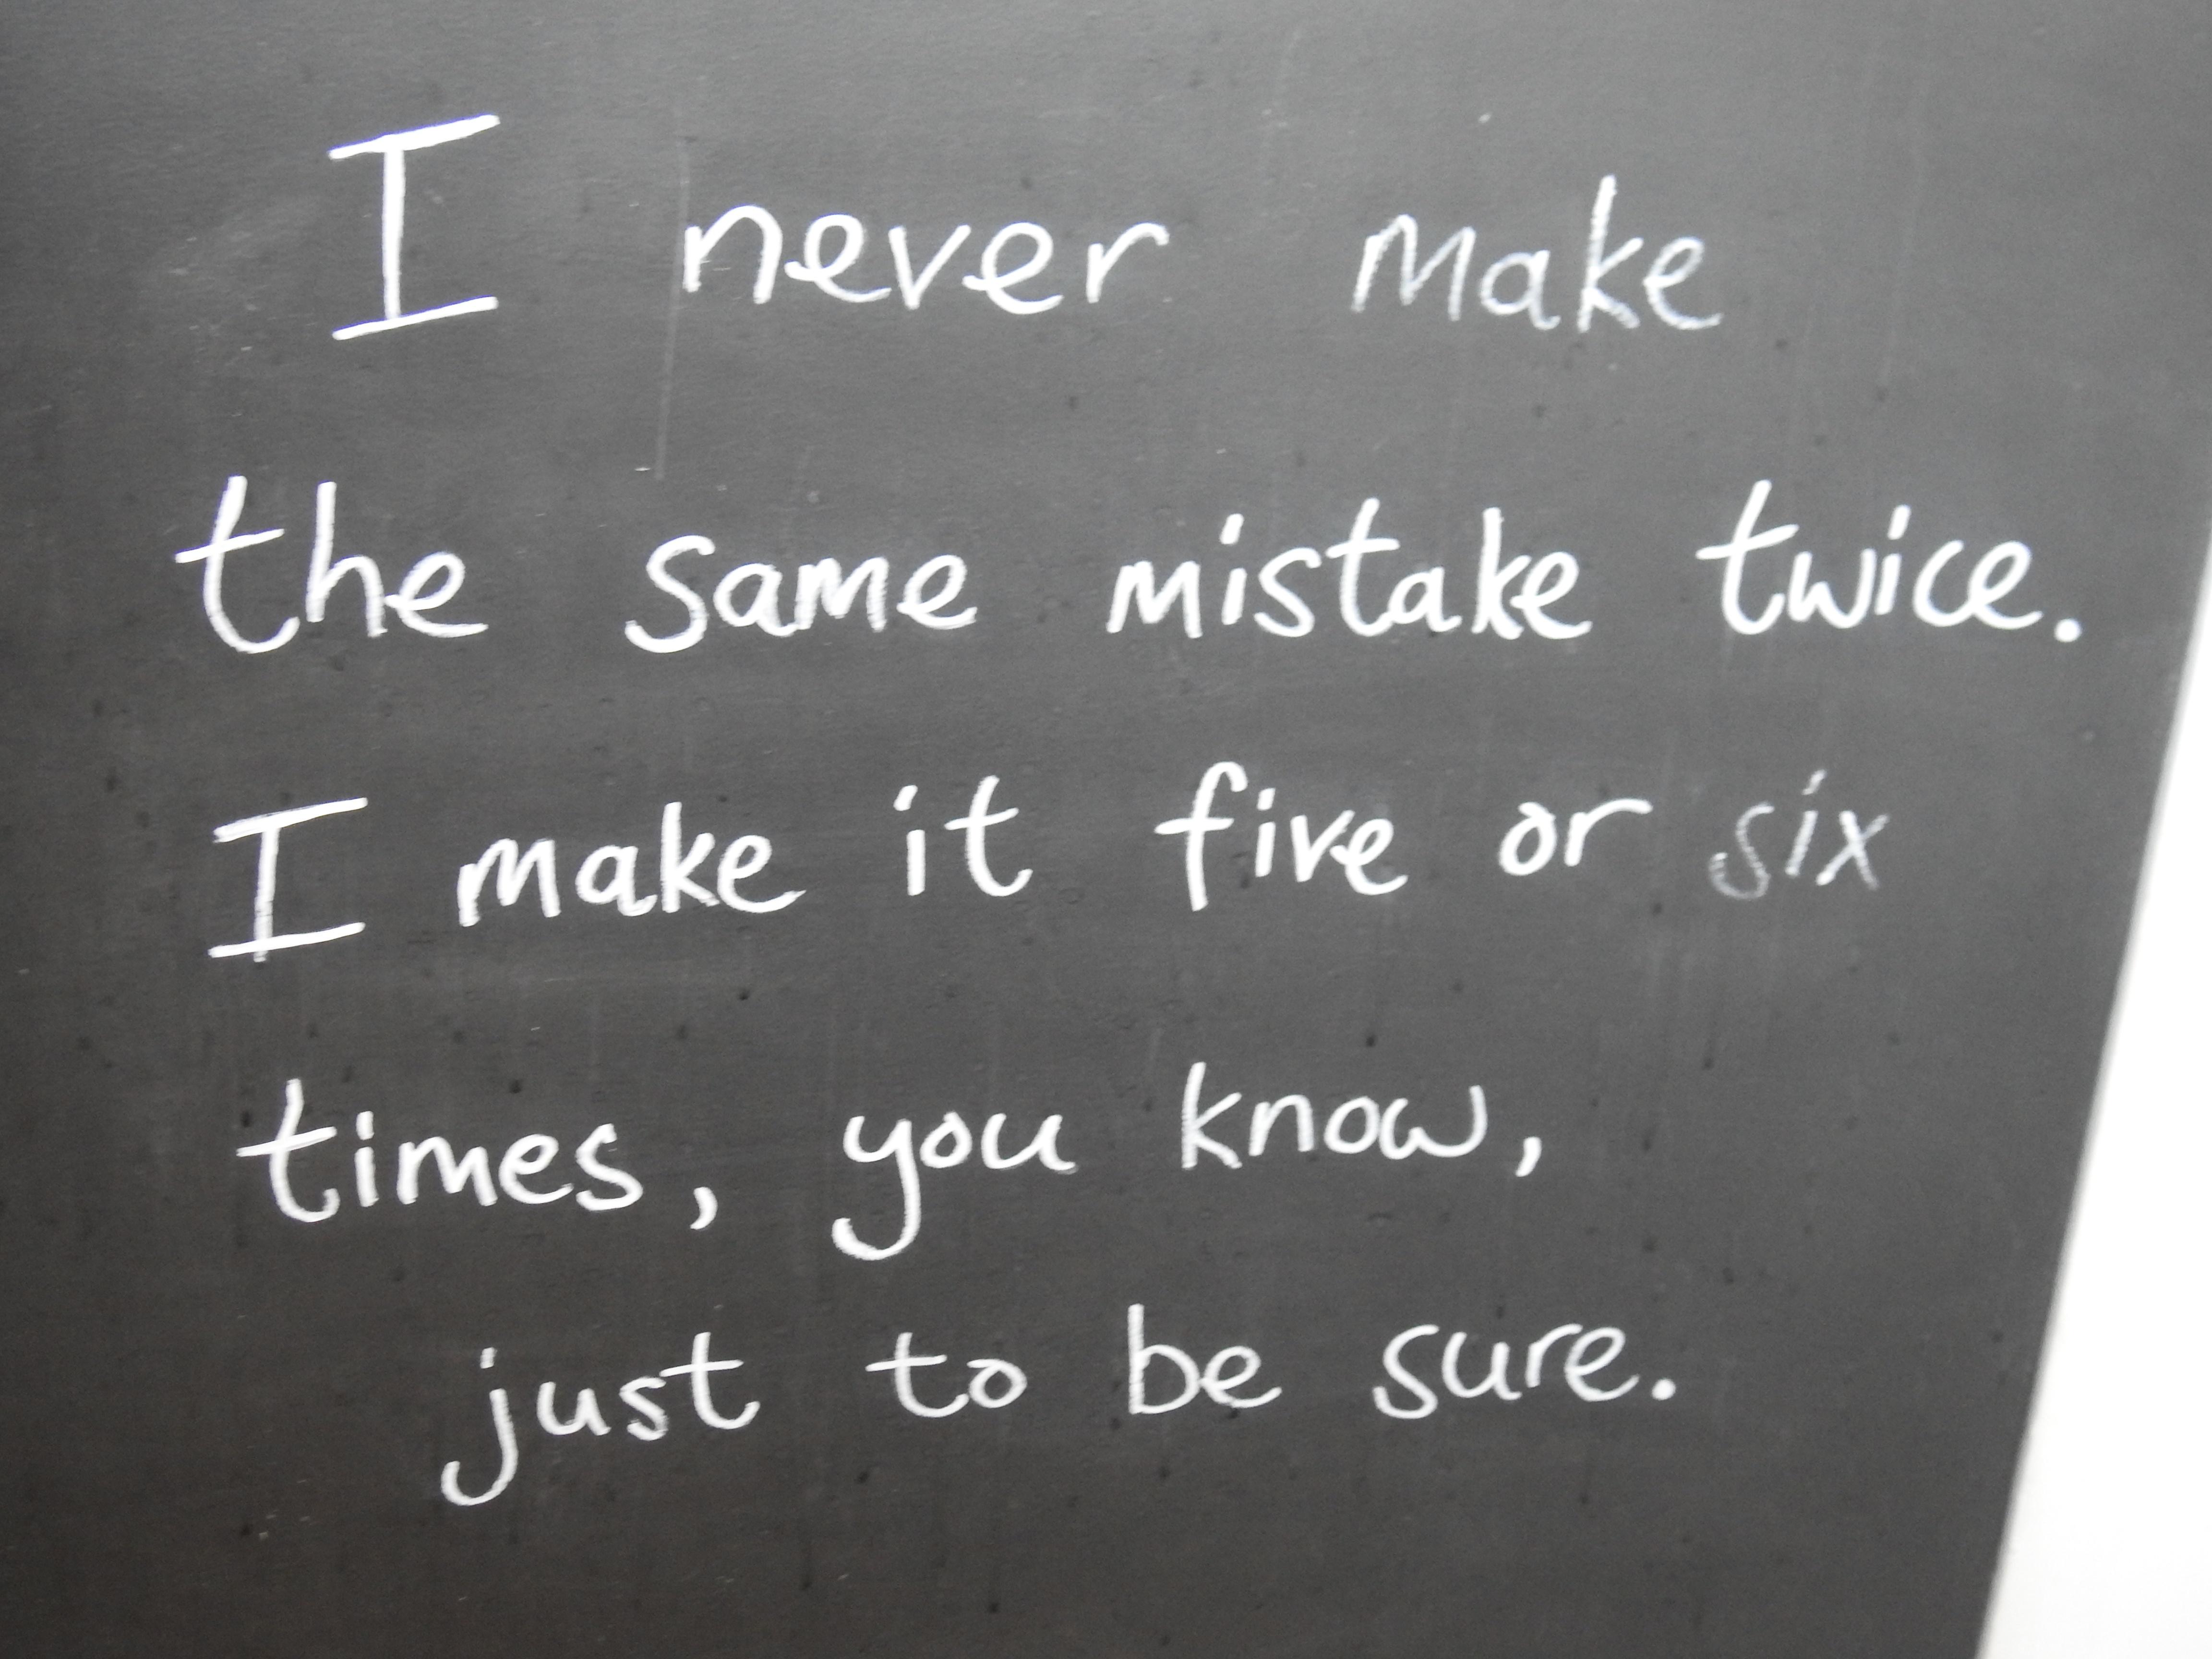 Same_mistake_twice.jpg